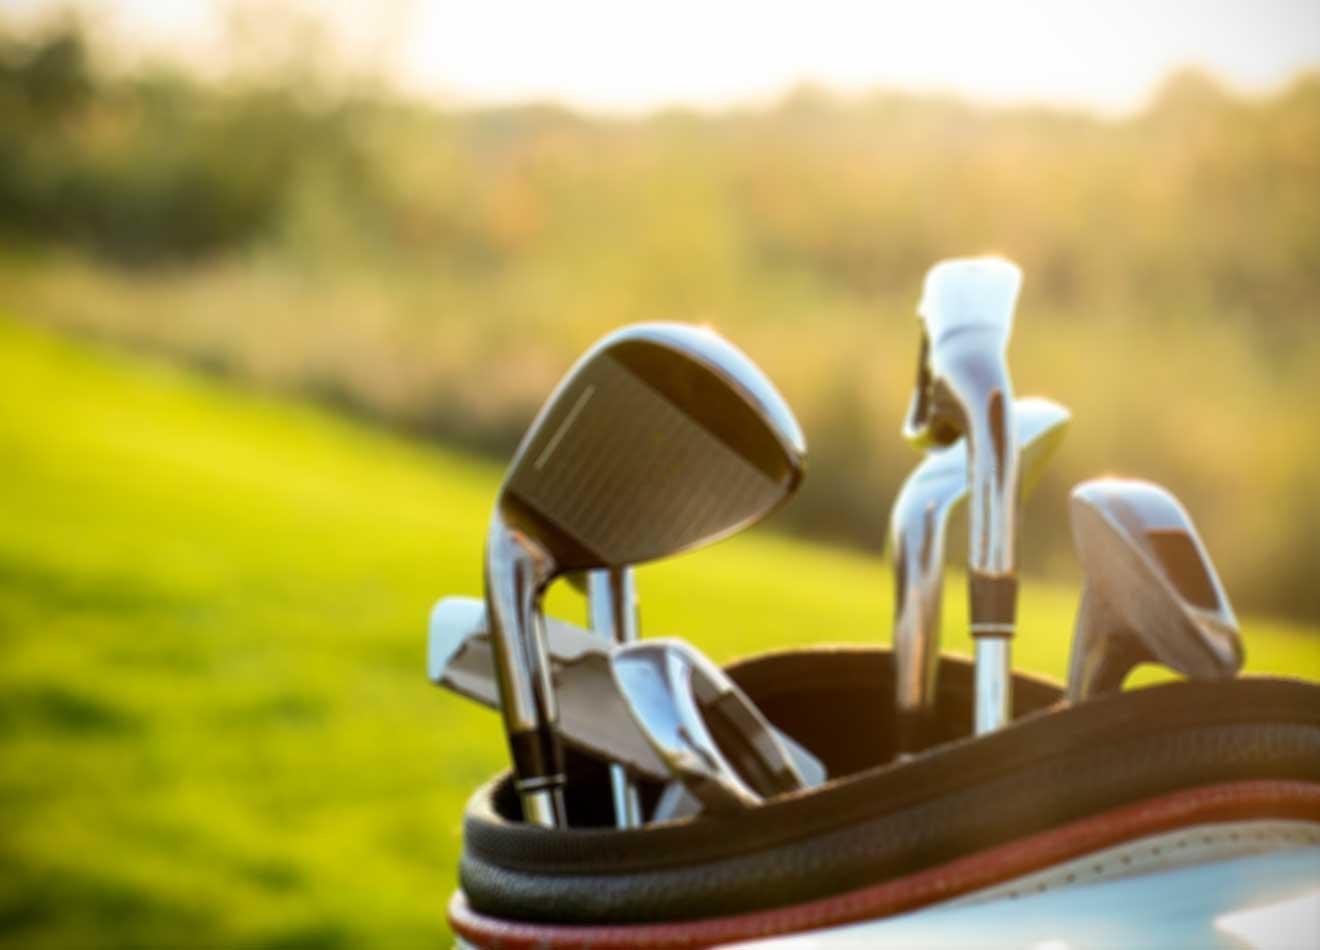 2021 President's Scholars Golf Tournament Donation